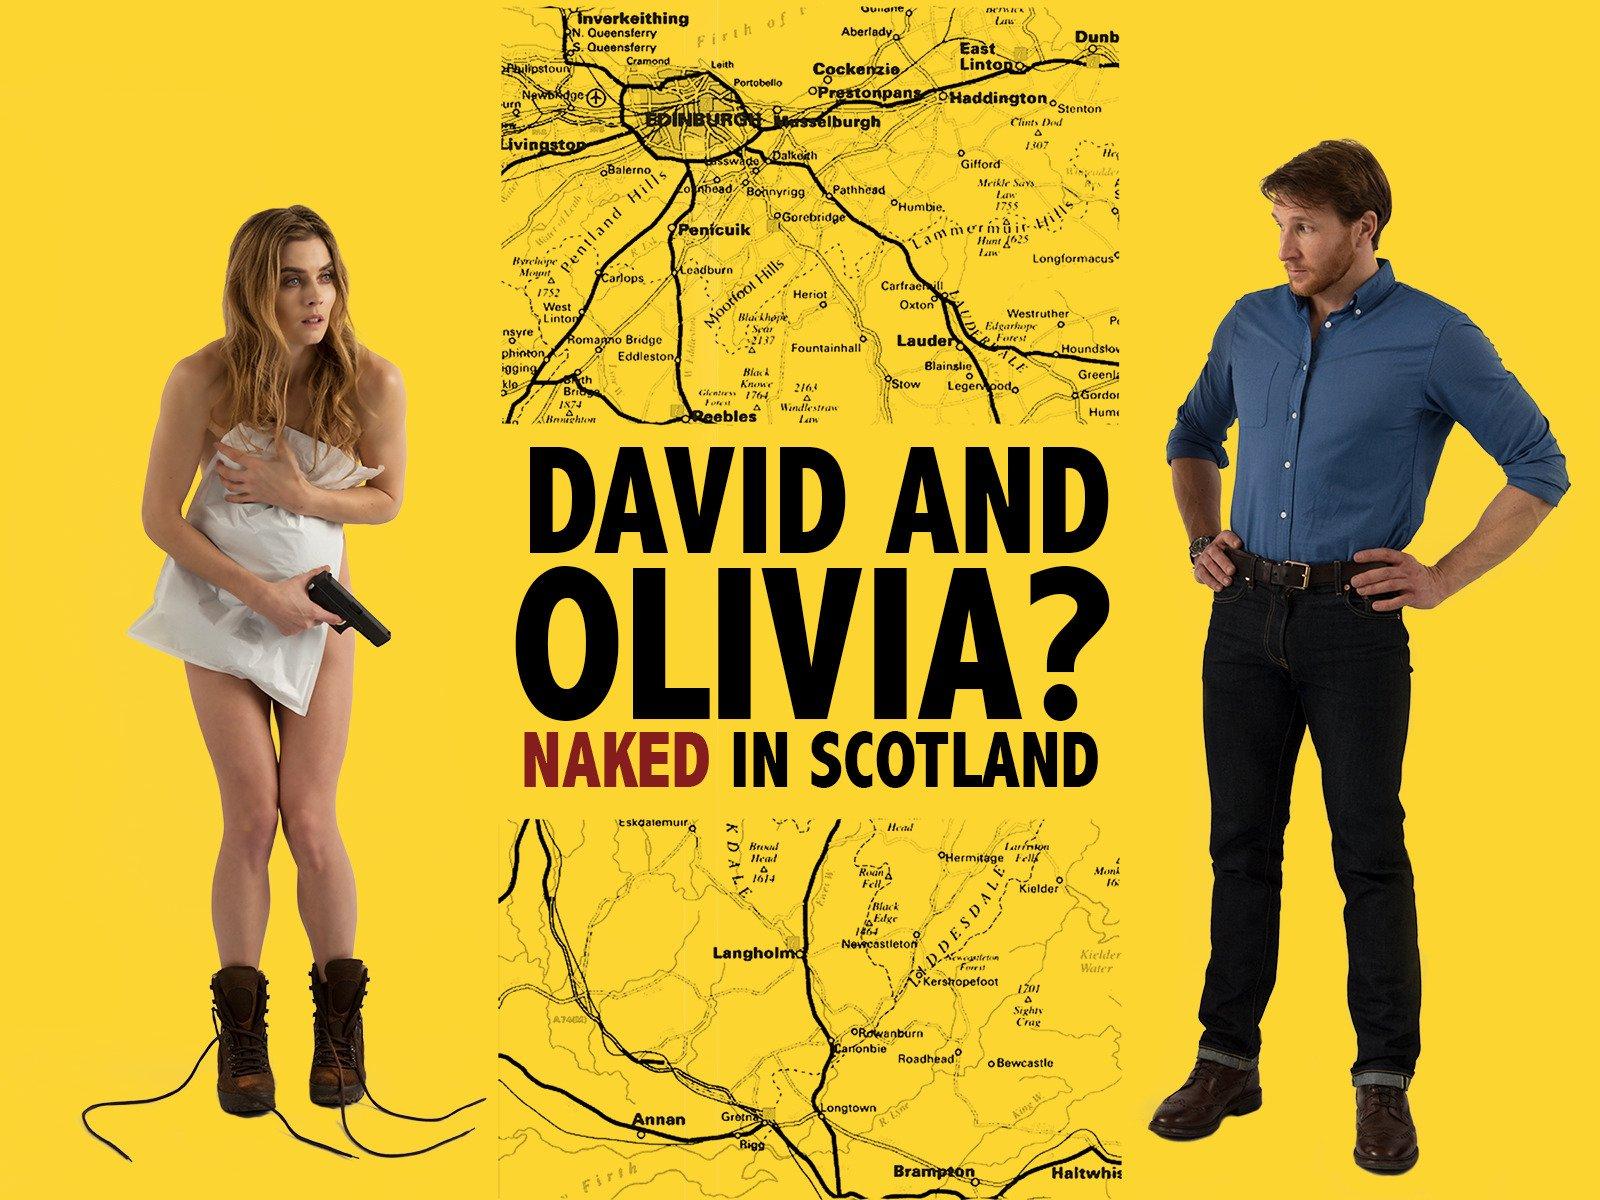 David and Olivia? - Season 1